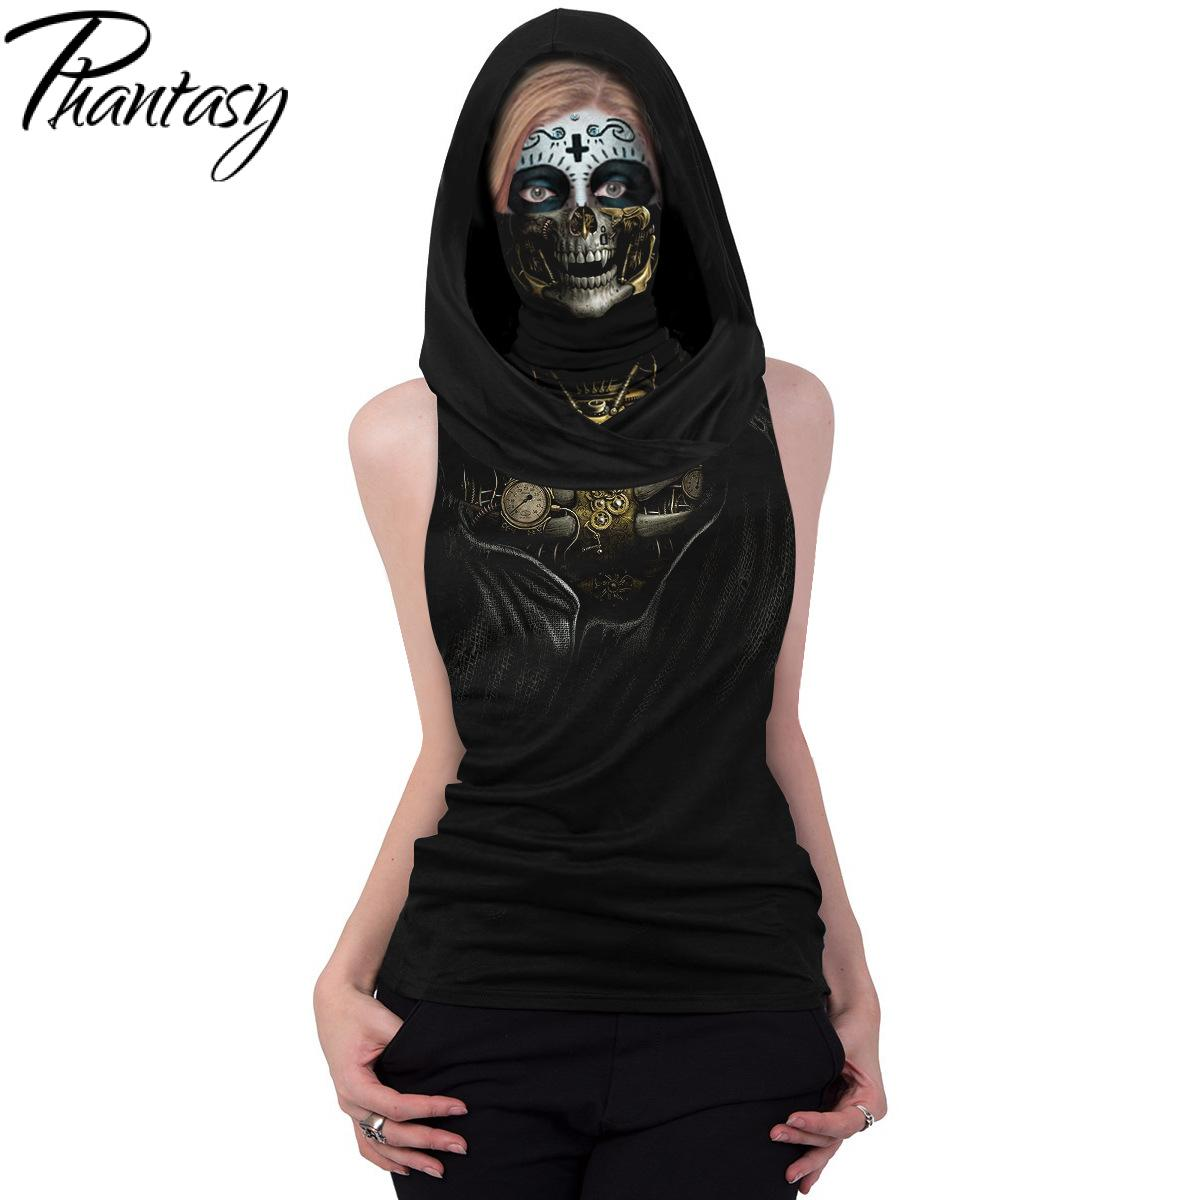 Phantasy famale roupas femininas crânio esqueleto máscara t-shirts cosplay com capuz meia face cachecol tshirt festa de halloween topos sleeveles